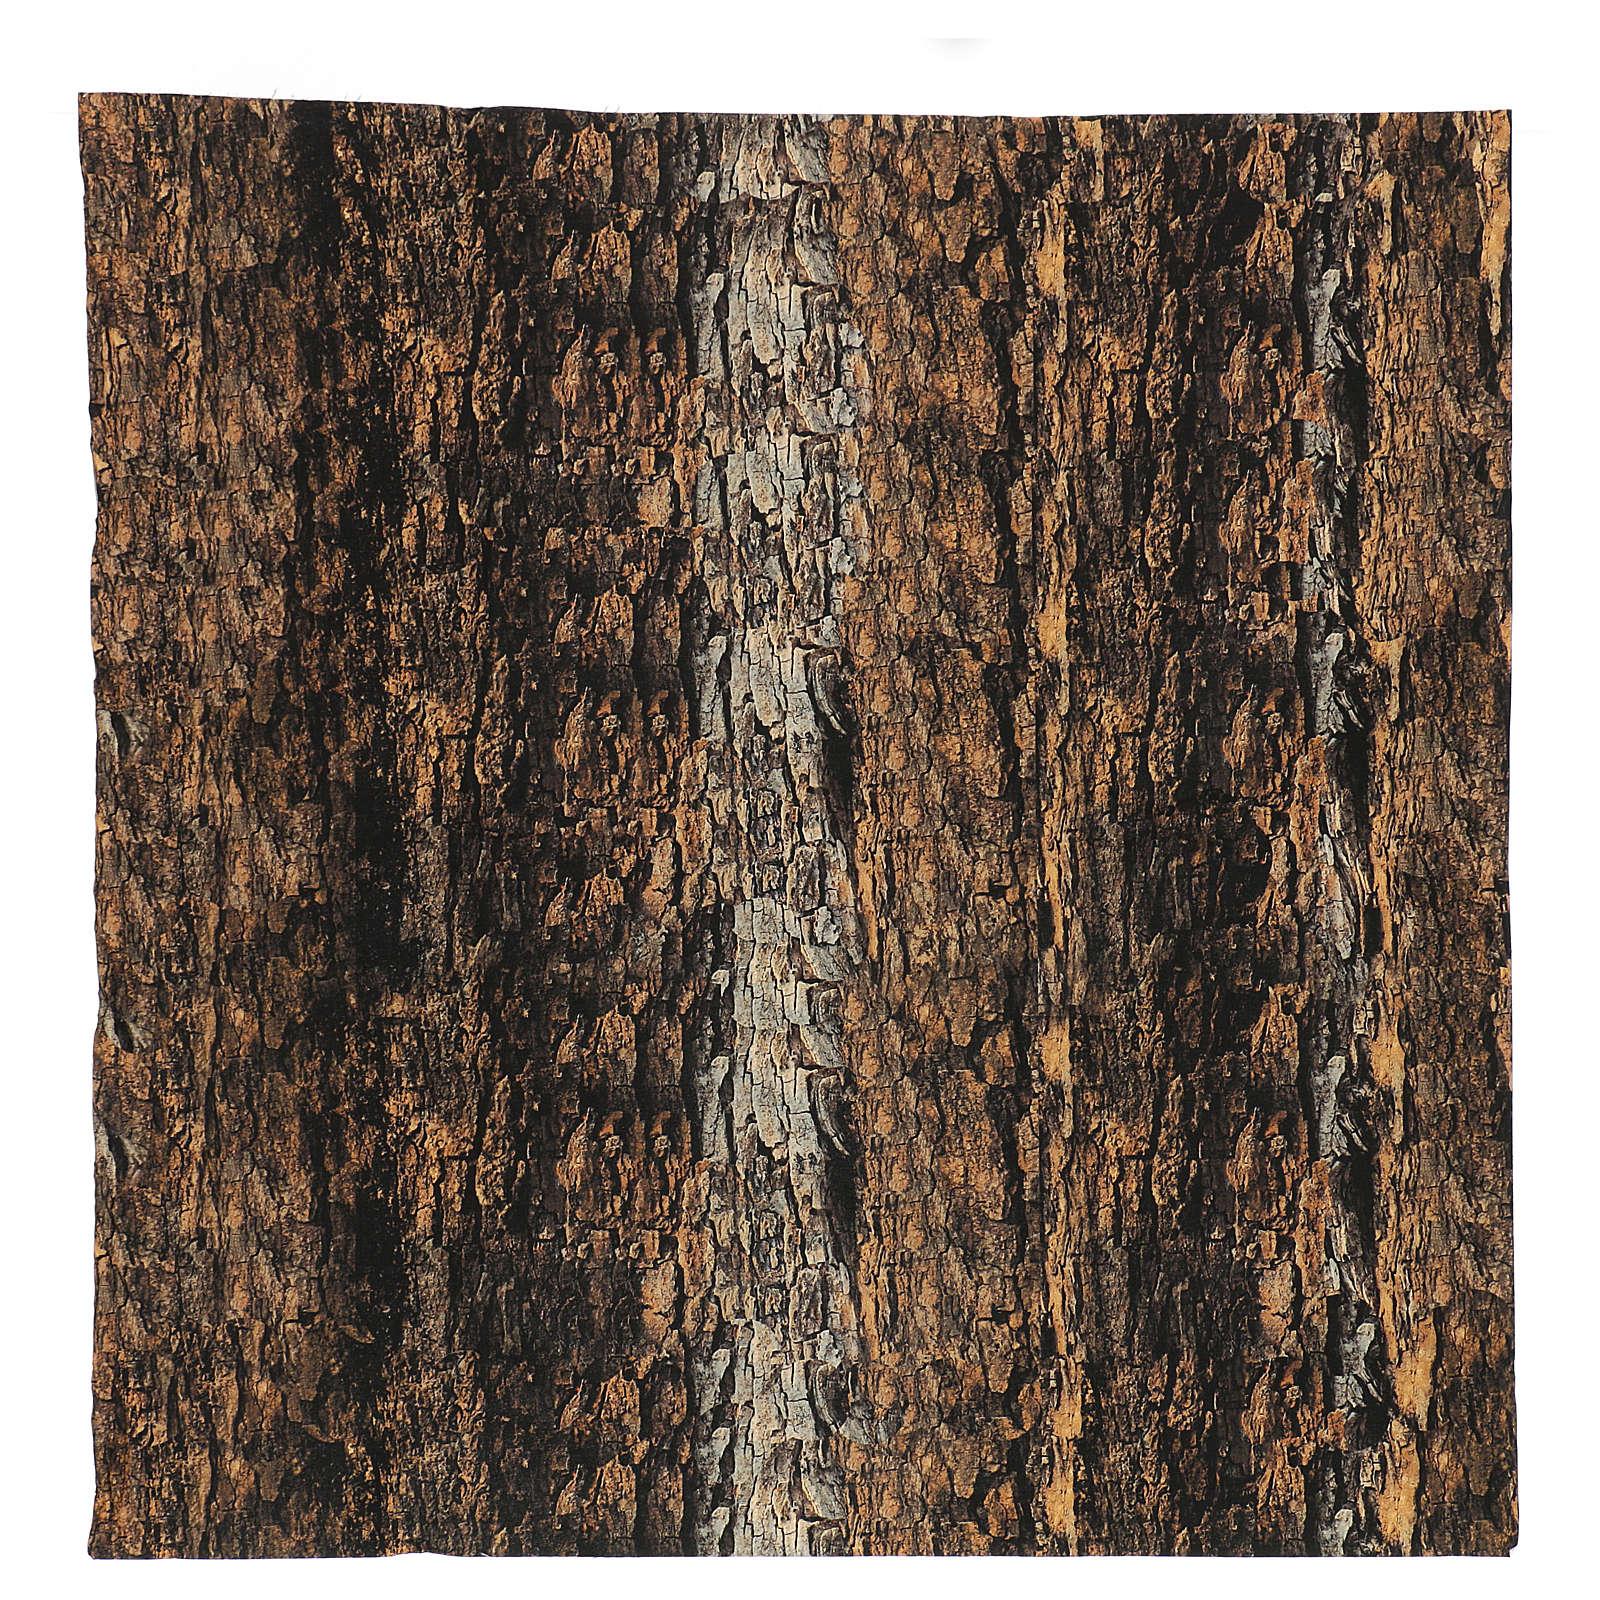 Nativity backdrop paper, cork 60x60 cm 4